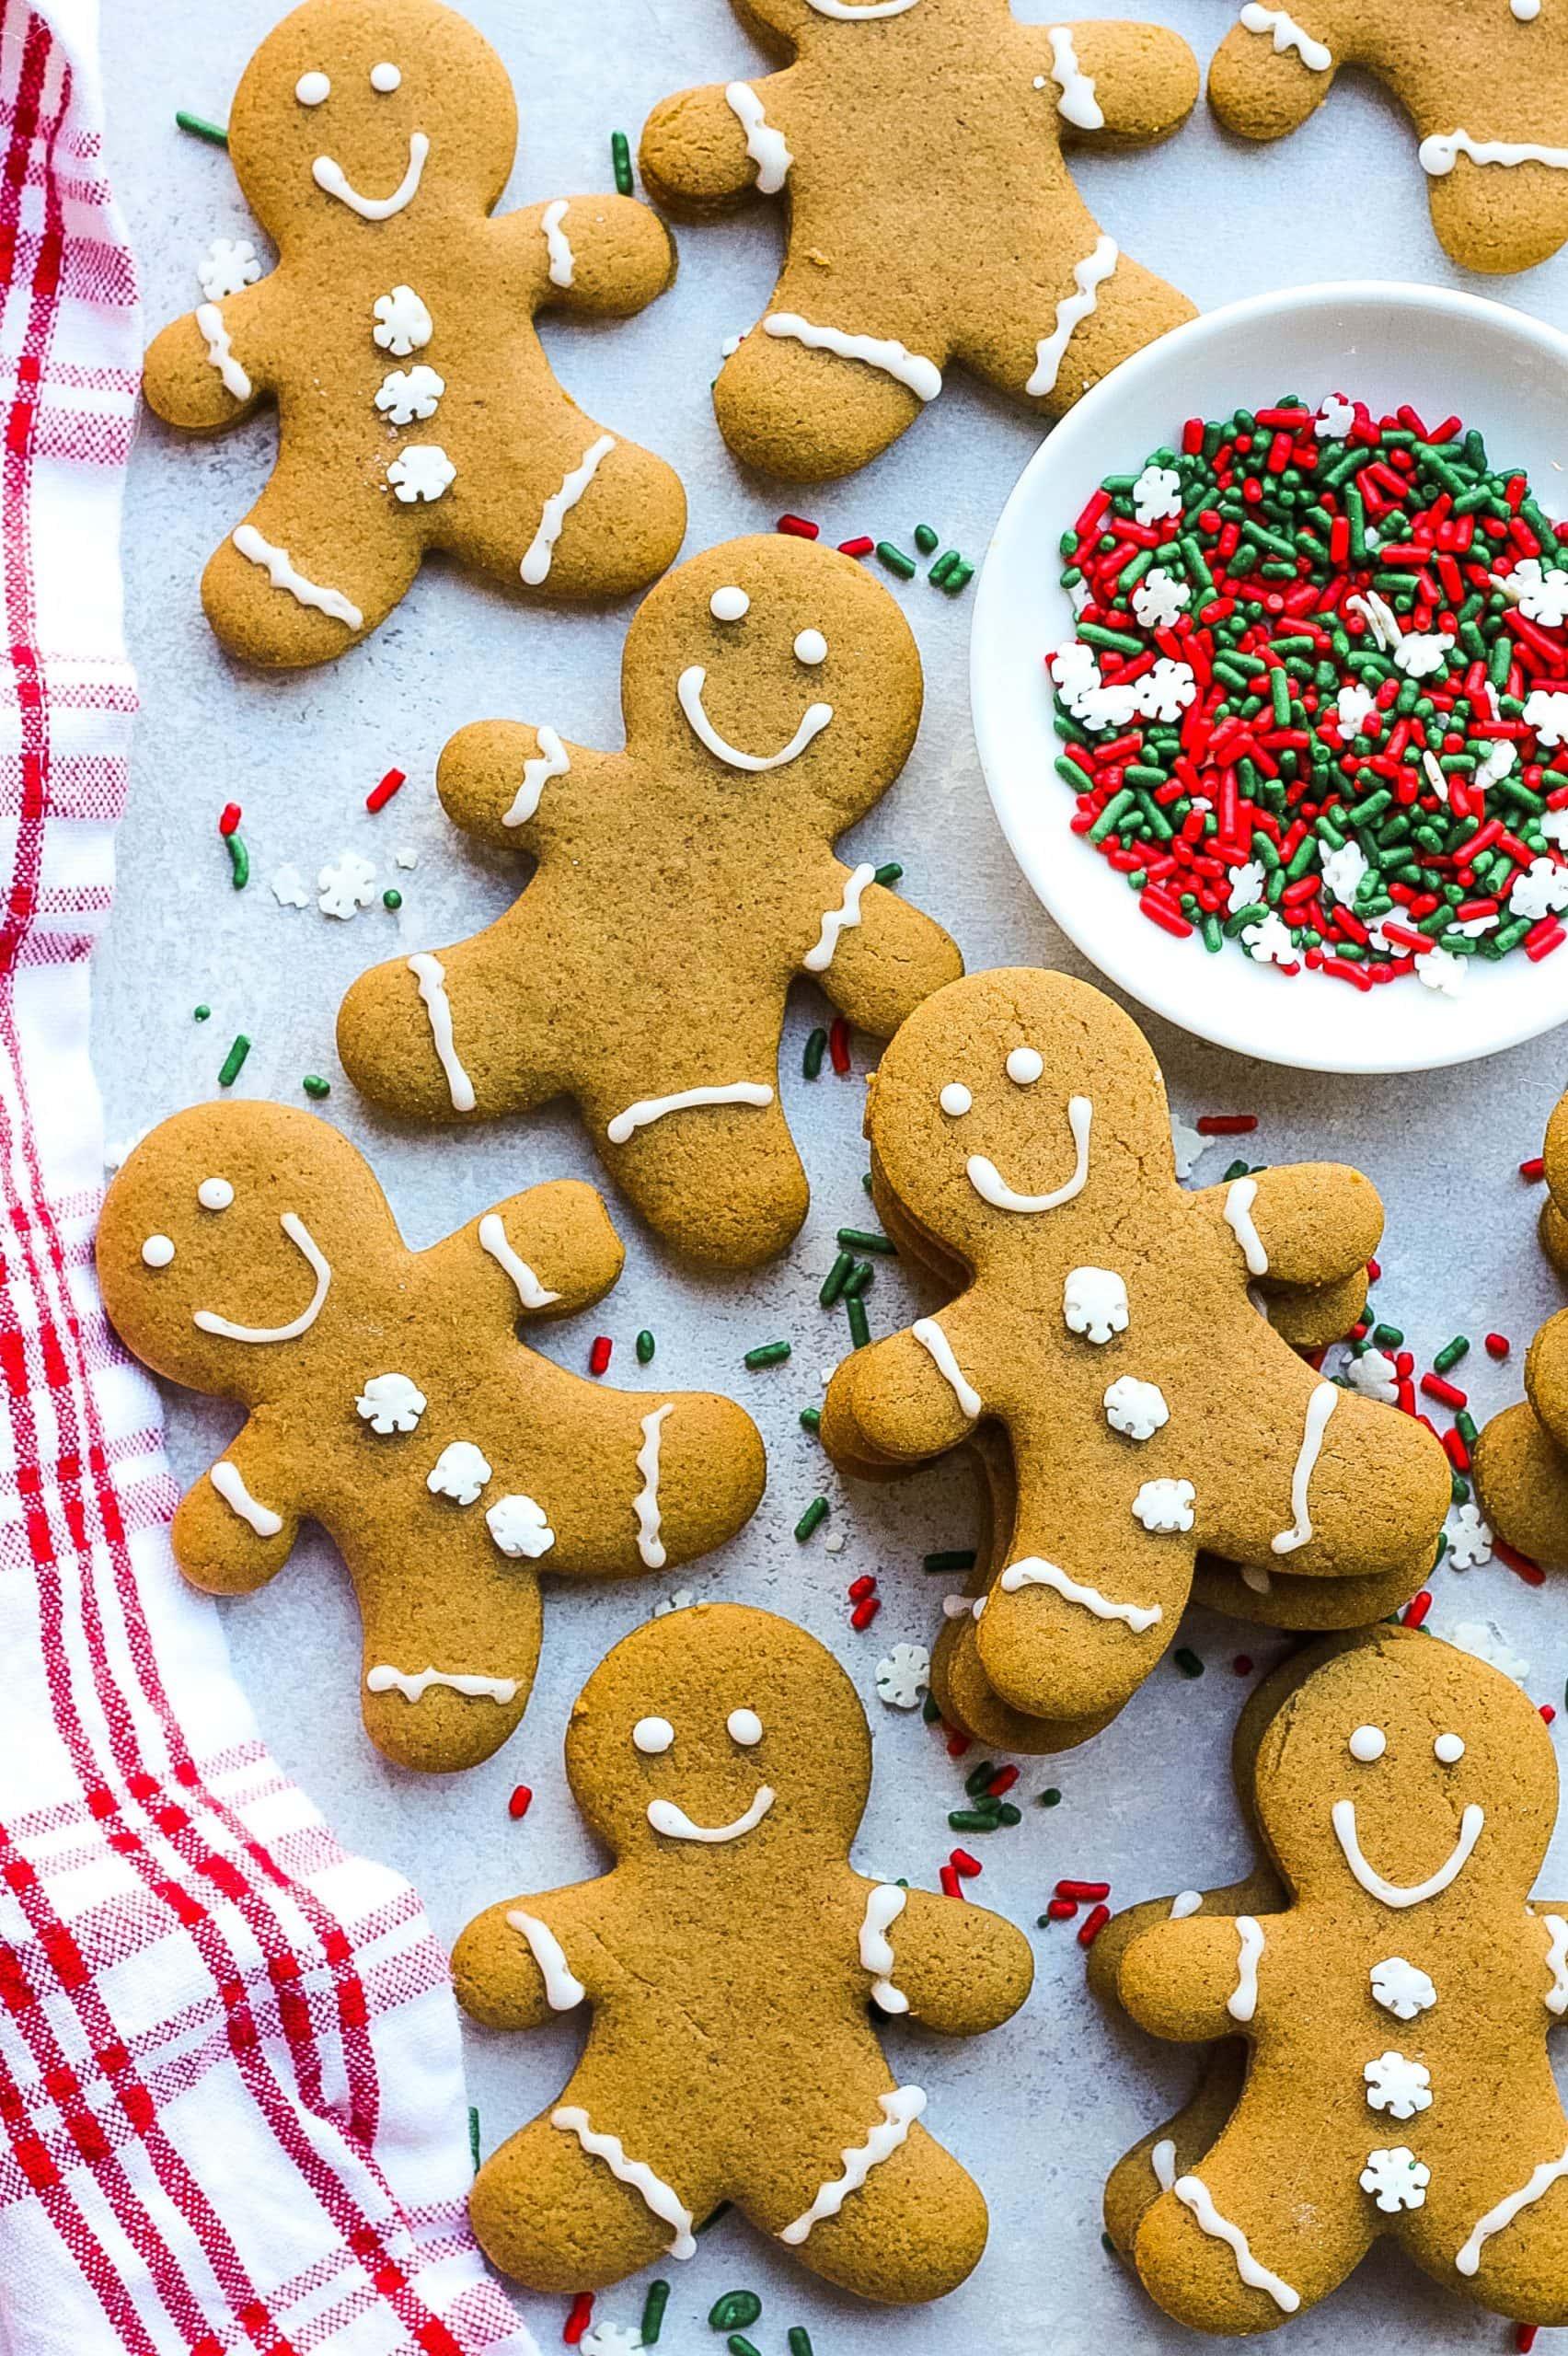 Gingbread men cookies